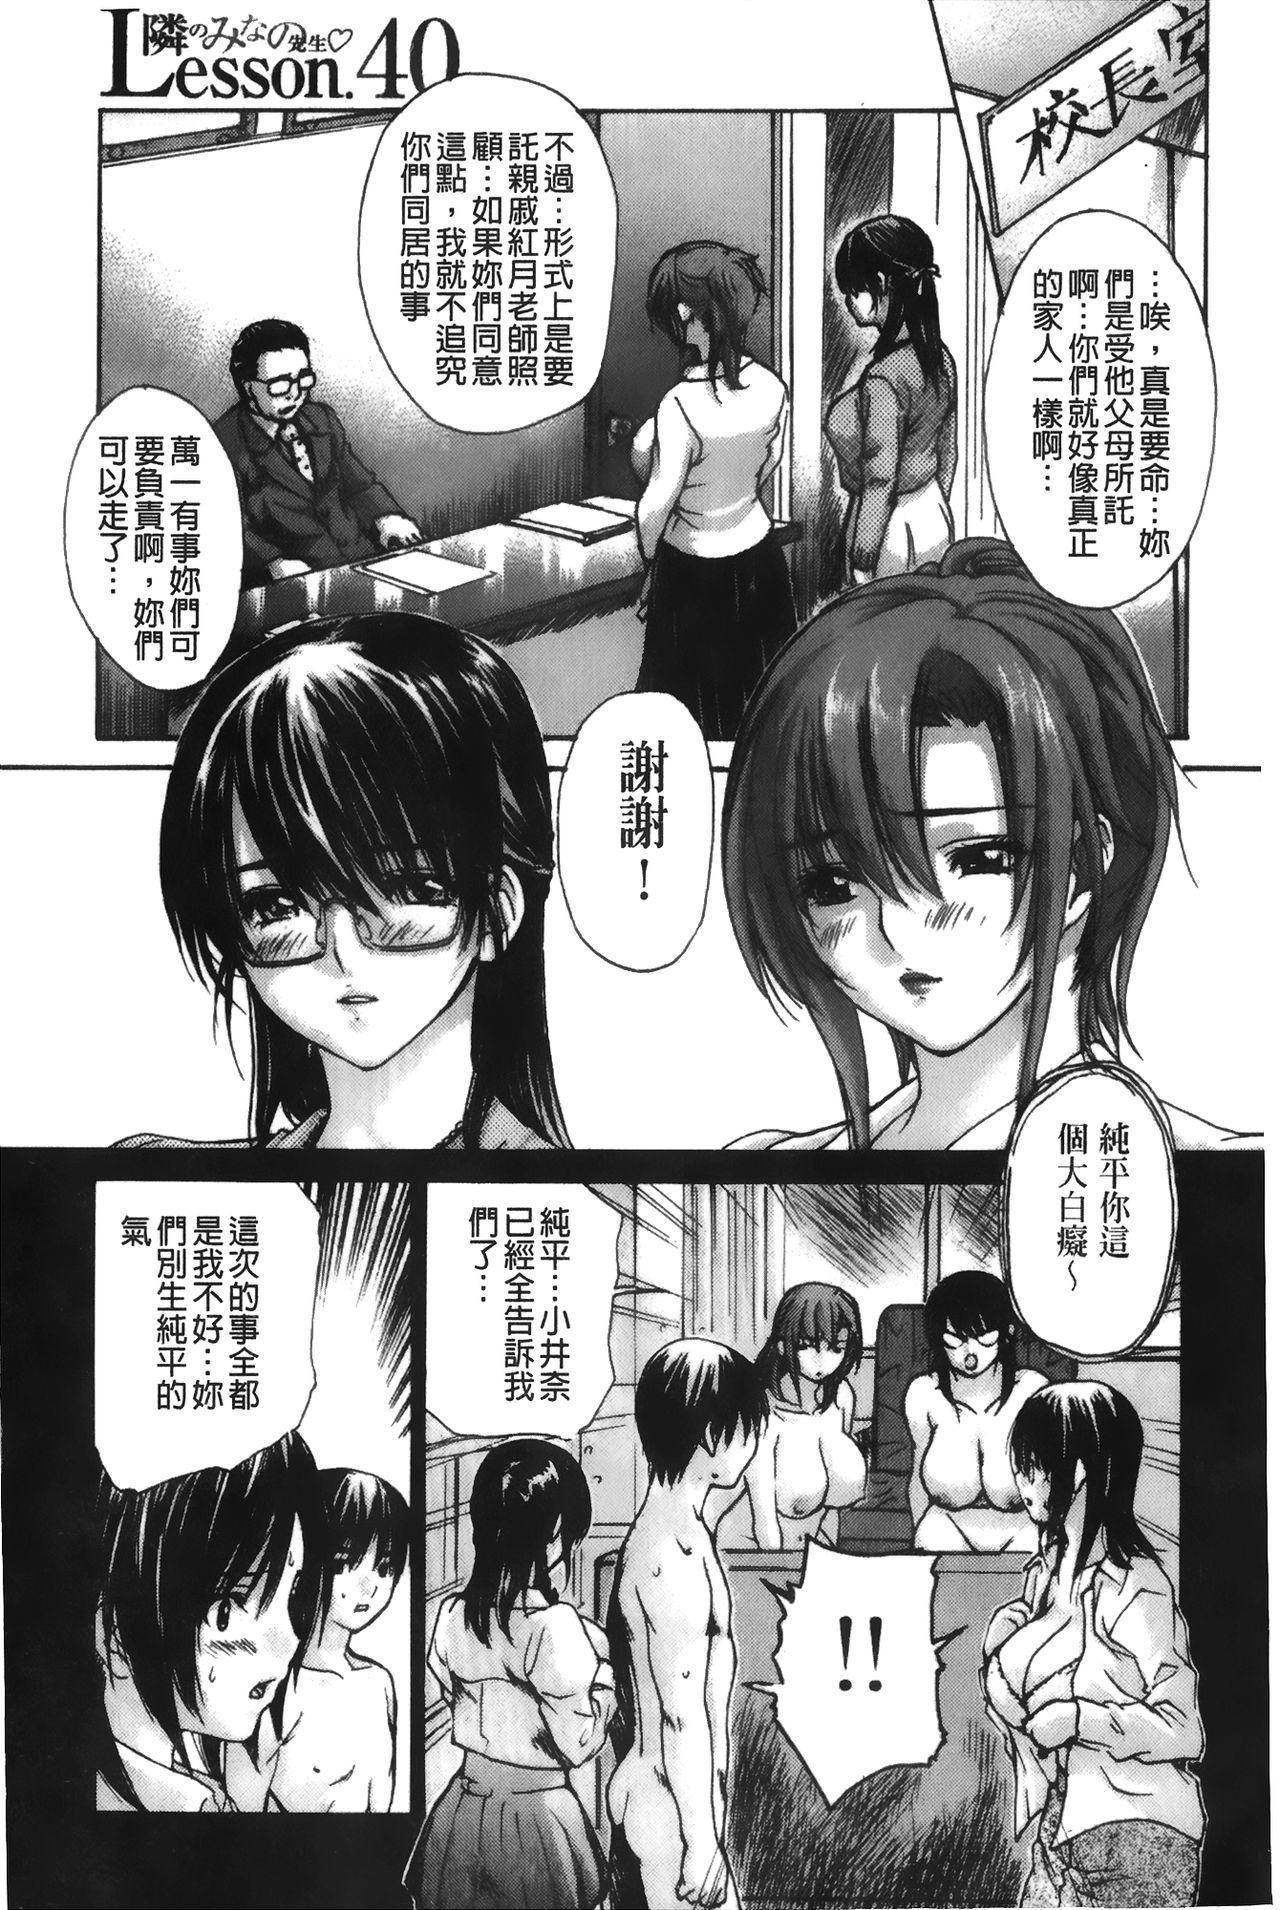 Tonari no Minano Sensei 4 | 隔壁的美奈乃老師 4 170